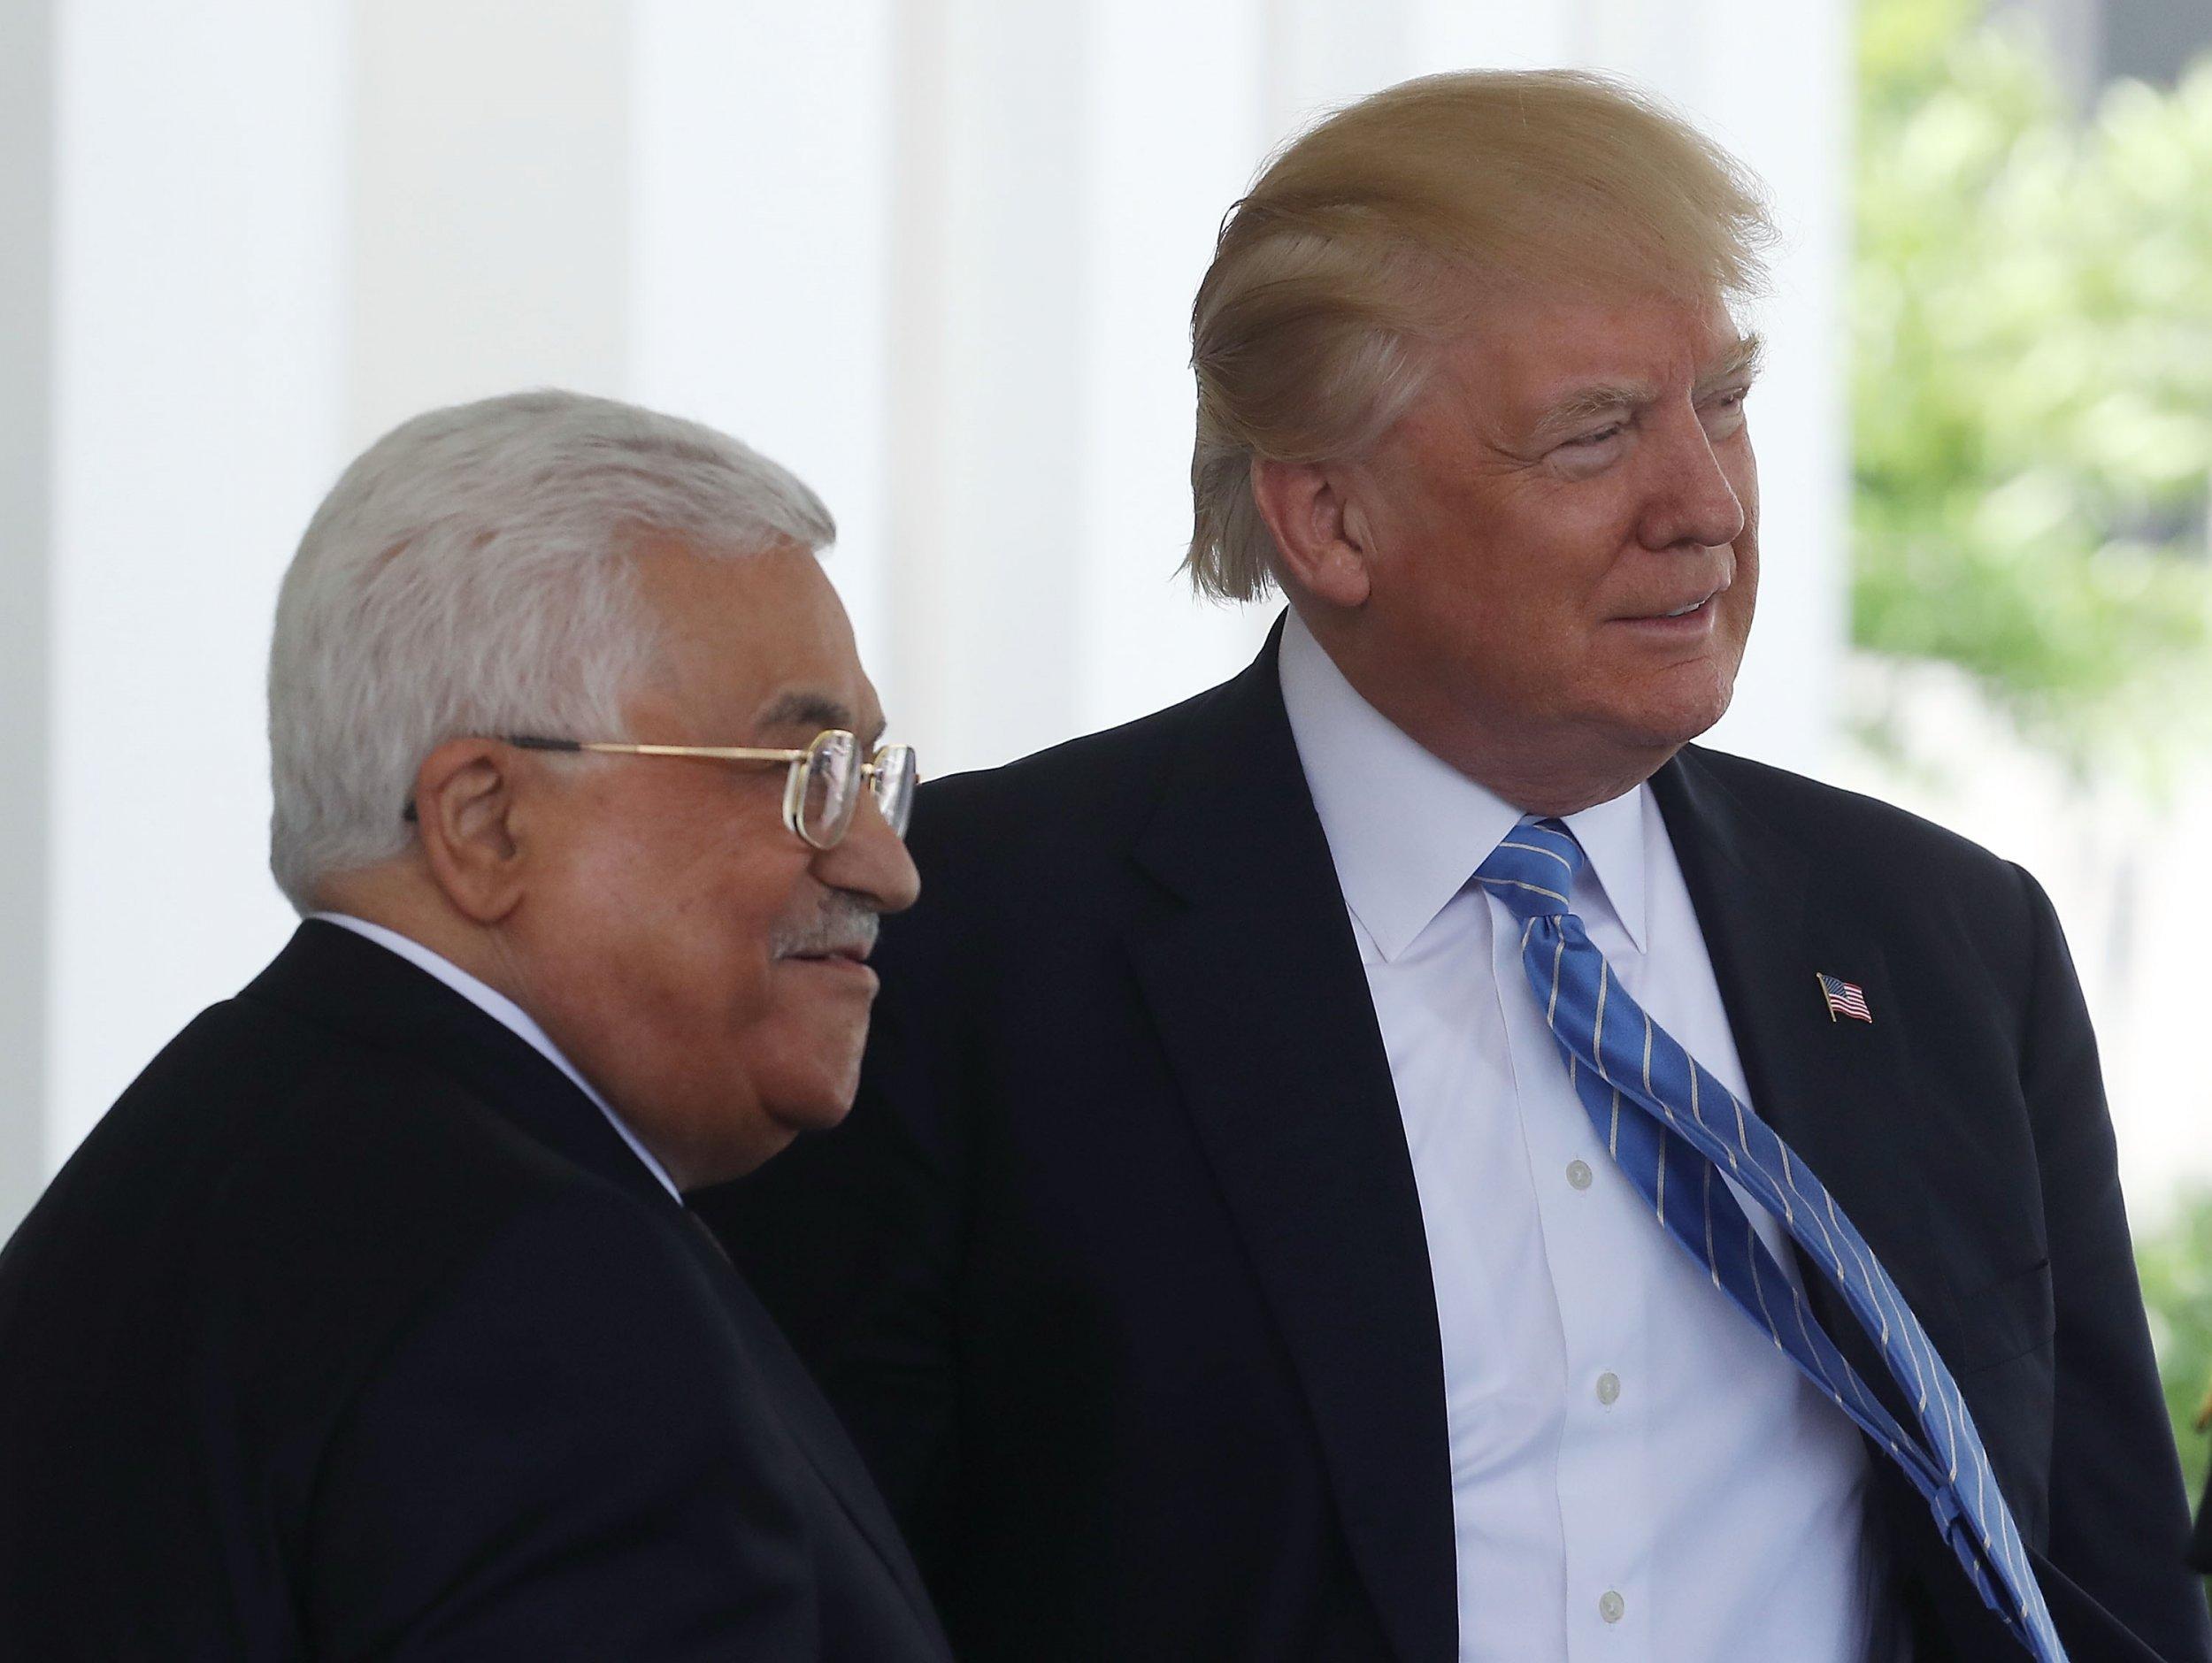 Mahmoud Abbas and Donald Trump